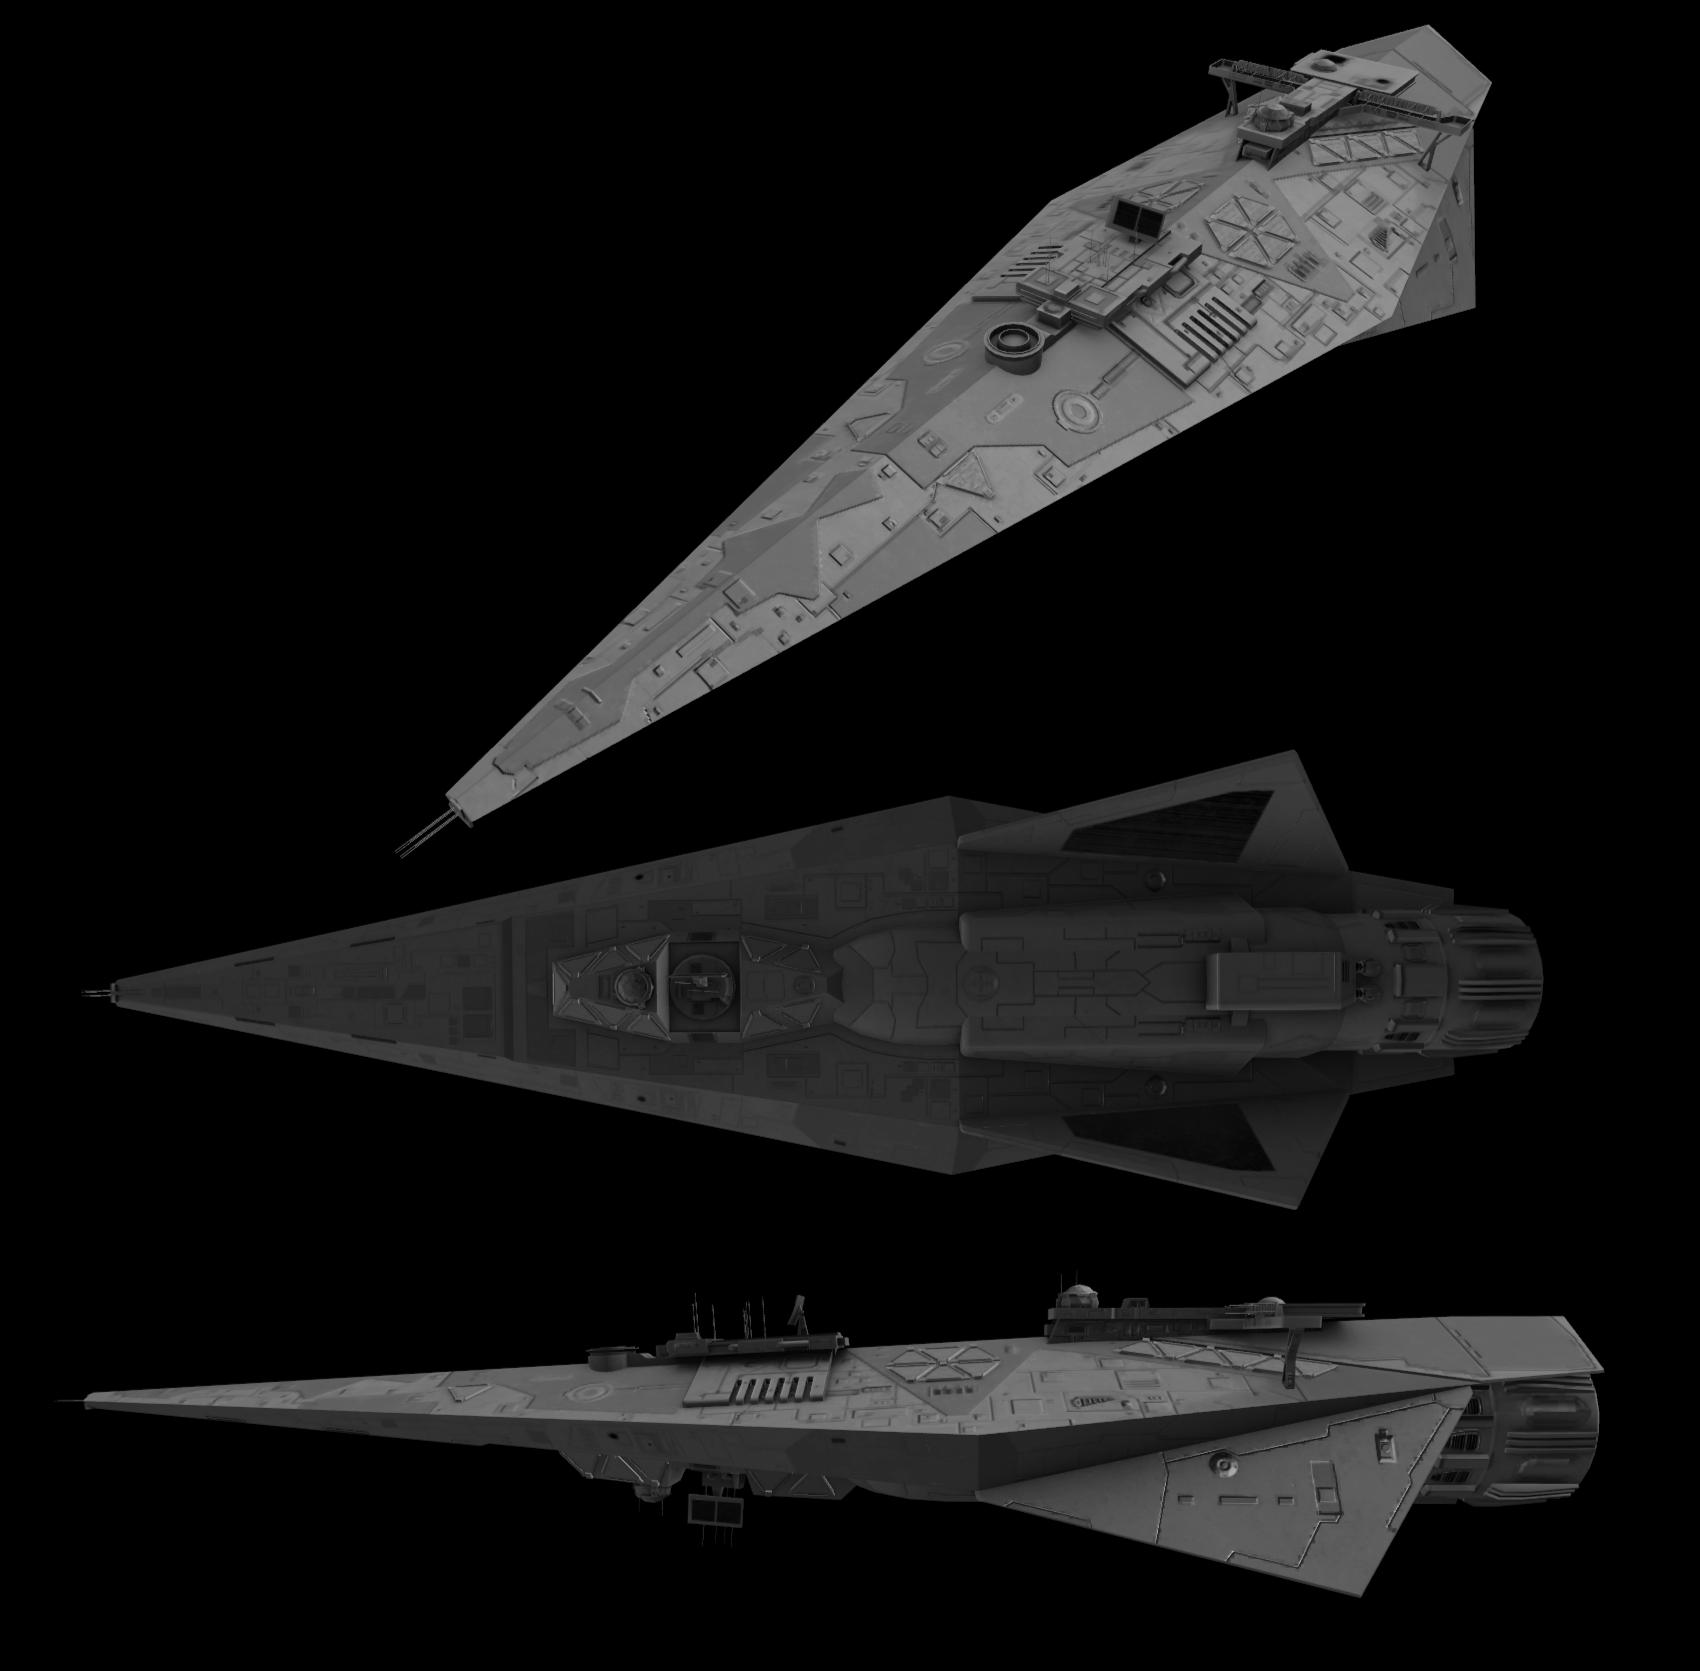 Indictor Class Electronic Warefare Corvette Star Wars Ships Design Star Wars Vehicles Star Wars Ships